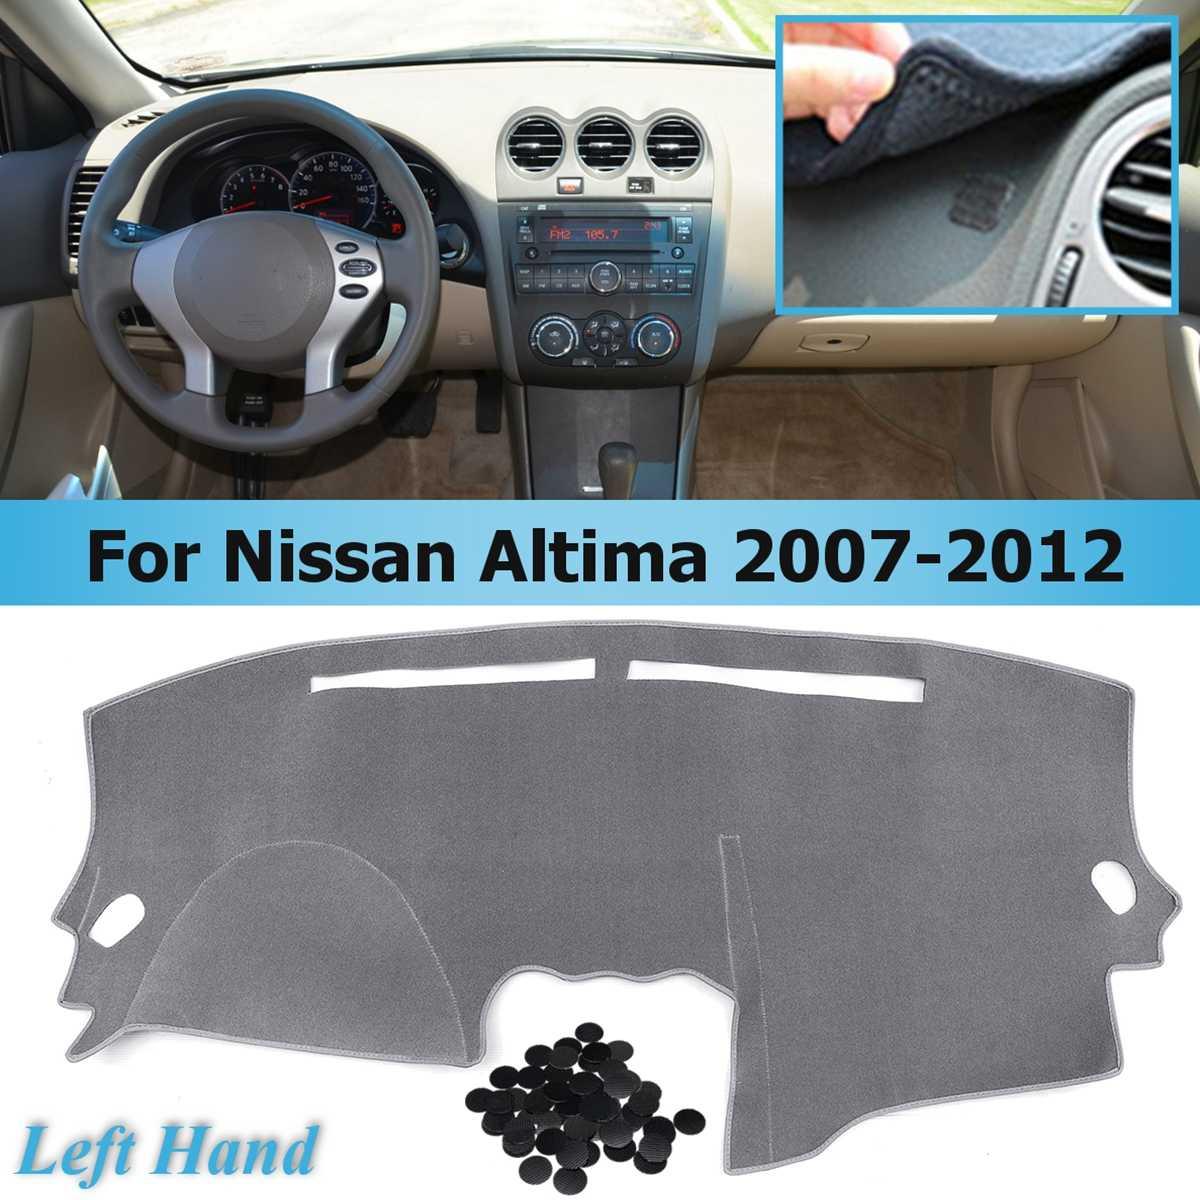 Estilo do carro cinza cobre dashmat traço esteira sun sombra painel capa tapete para nissan altima 2007 2008 2009 2010 2011 2012